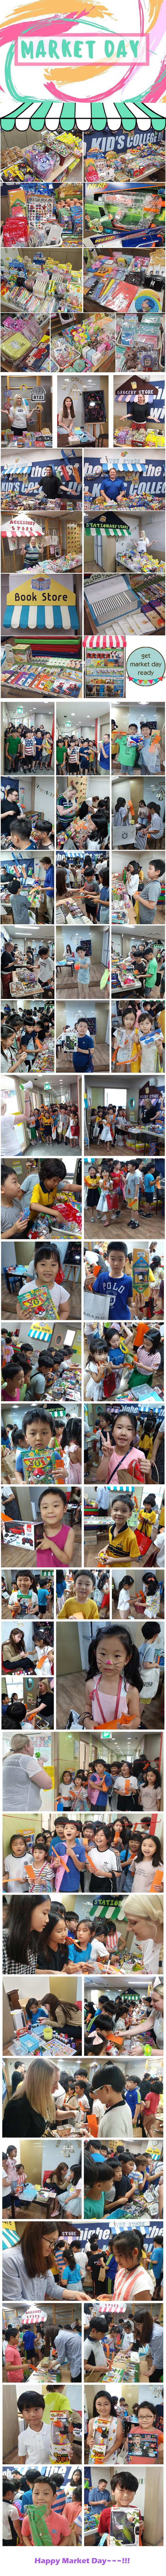 2019marketday_Elementary_July.jpg